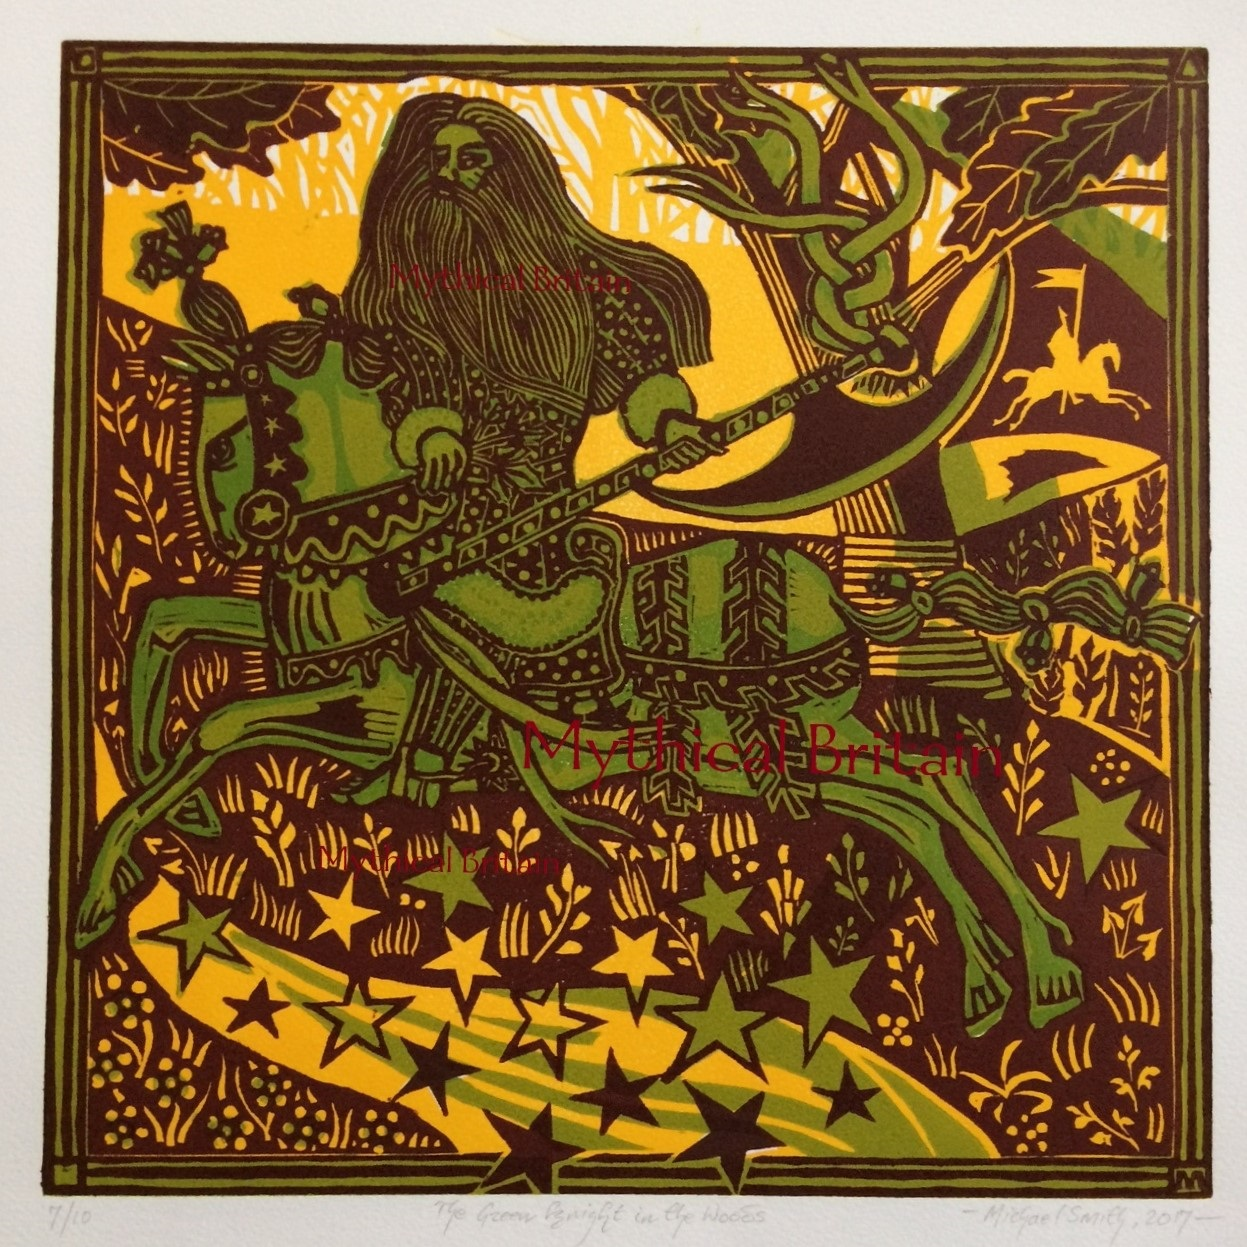 the green knight - photo #16